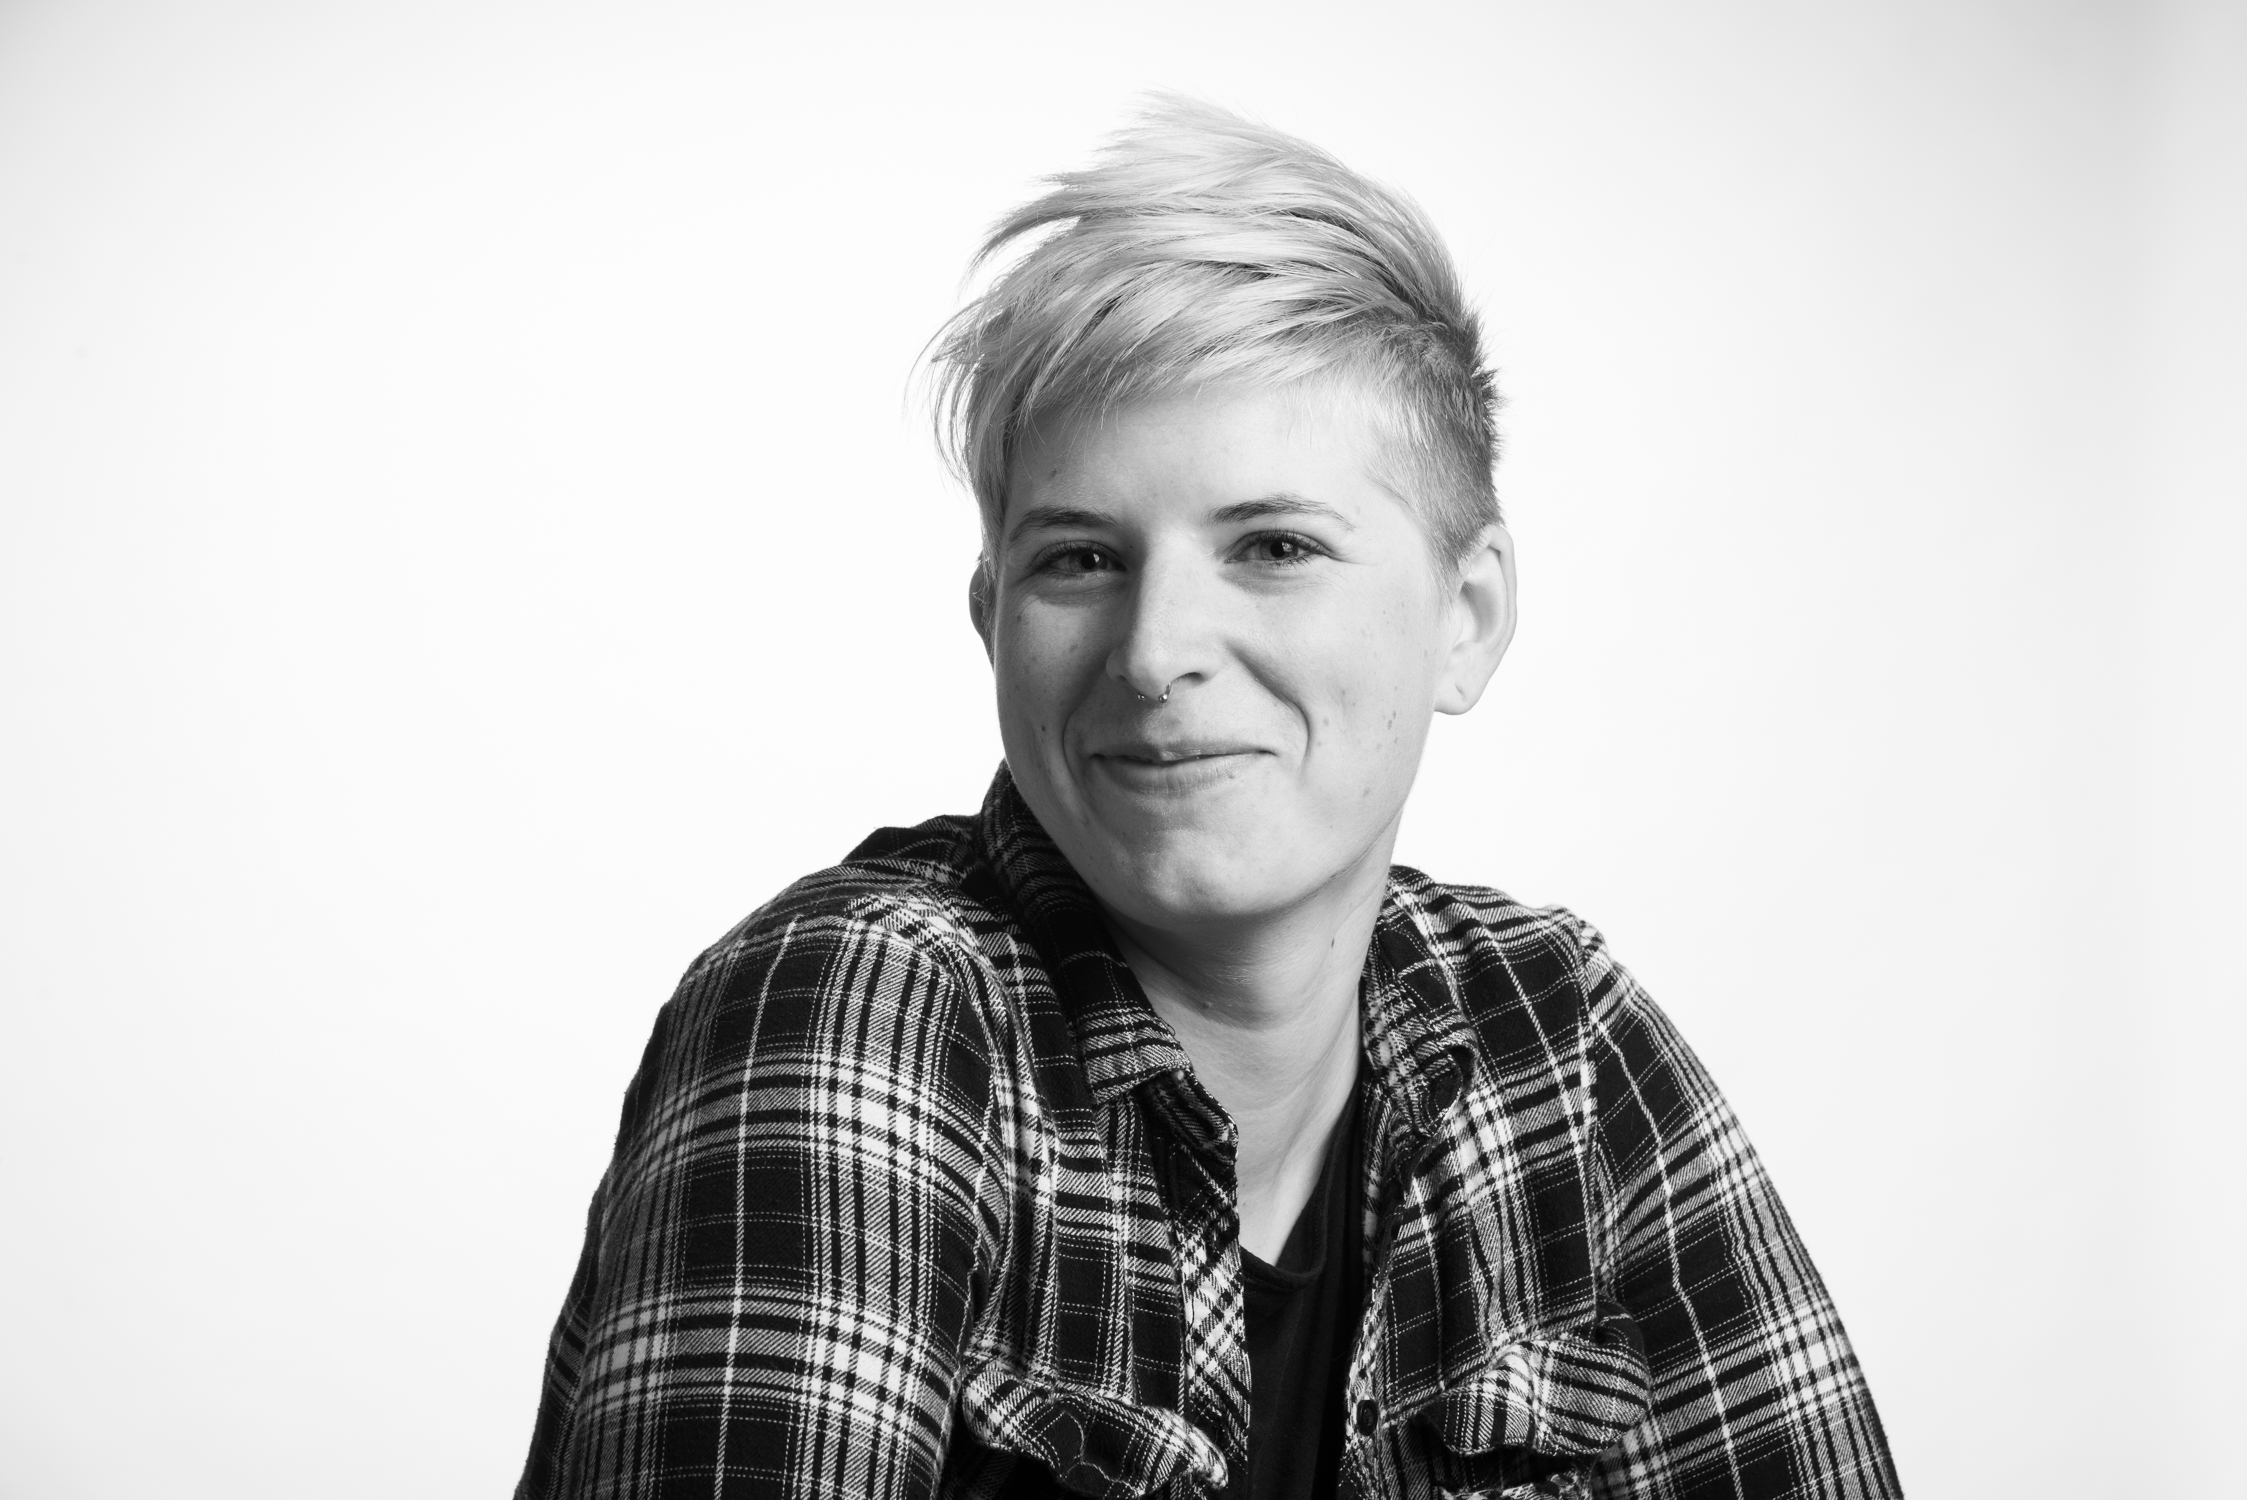 Erin Goodall